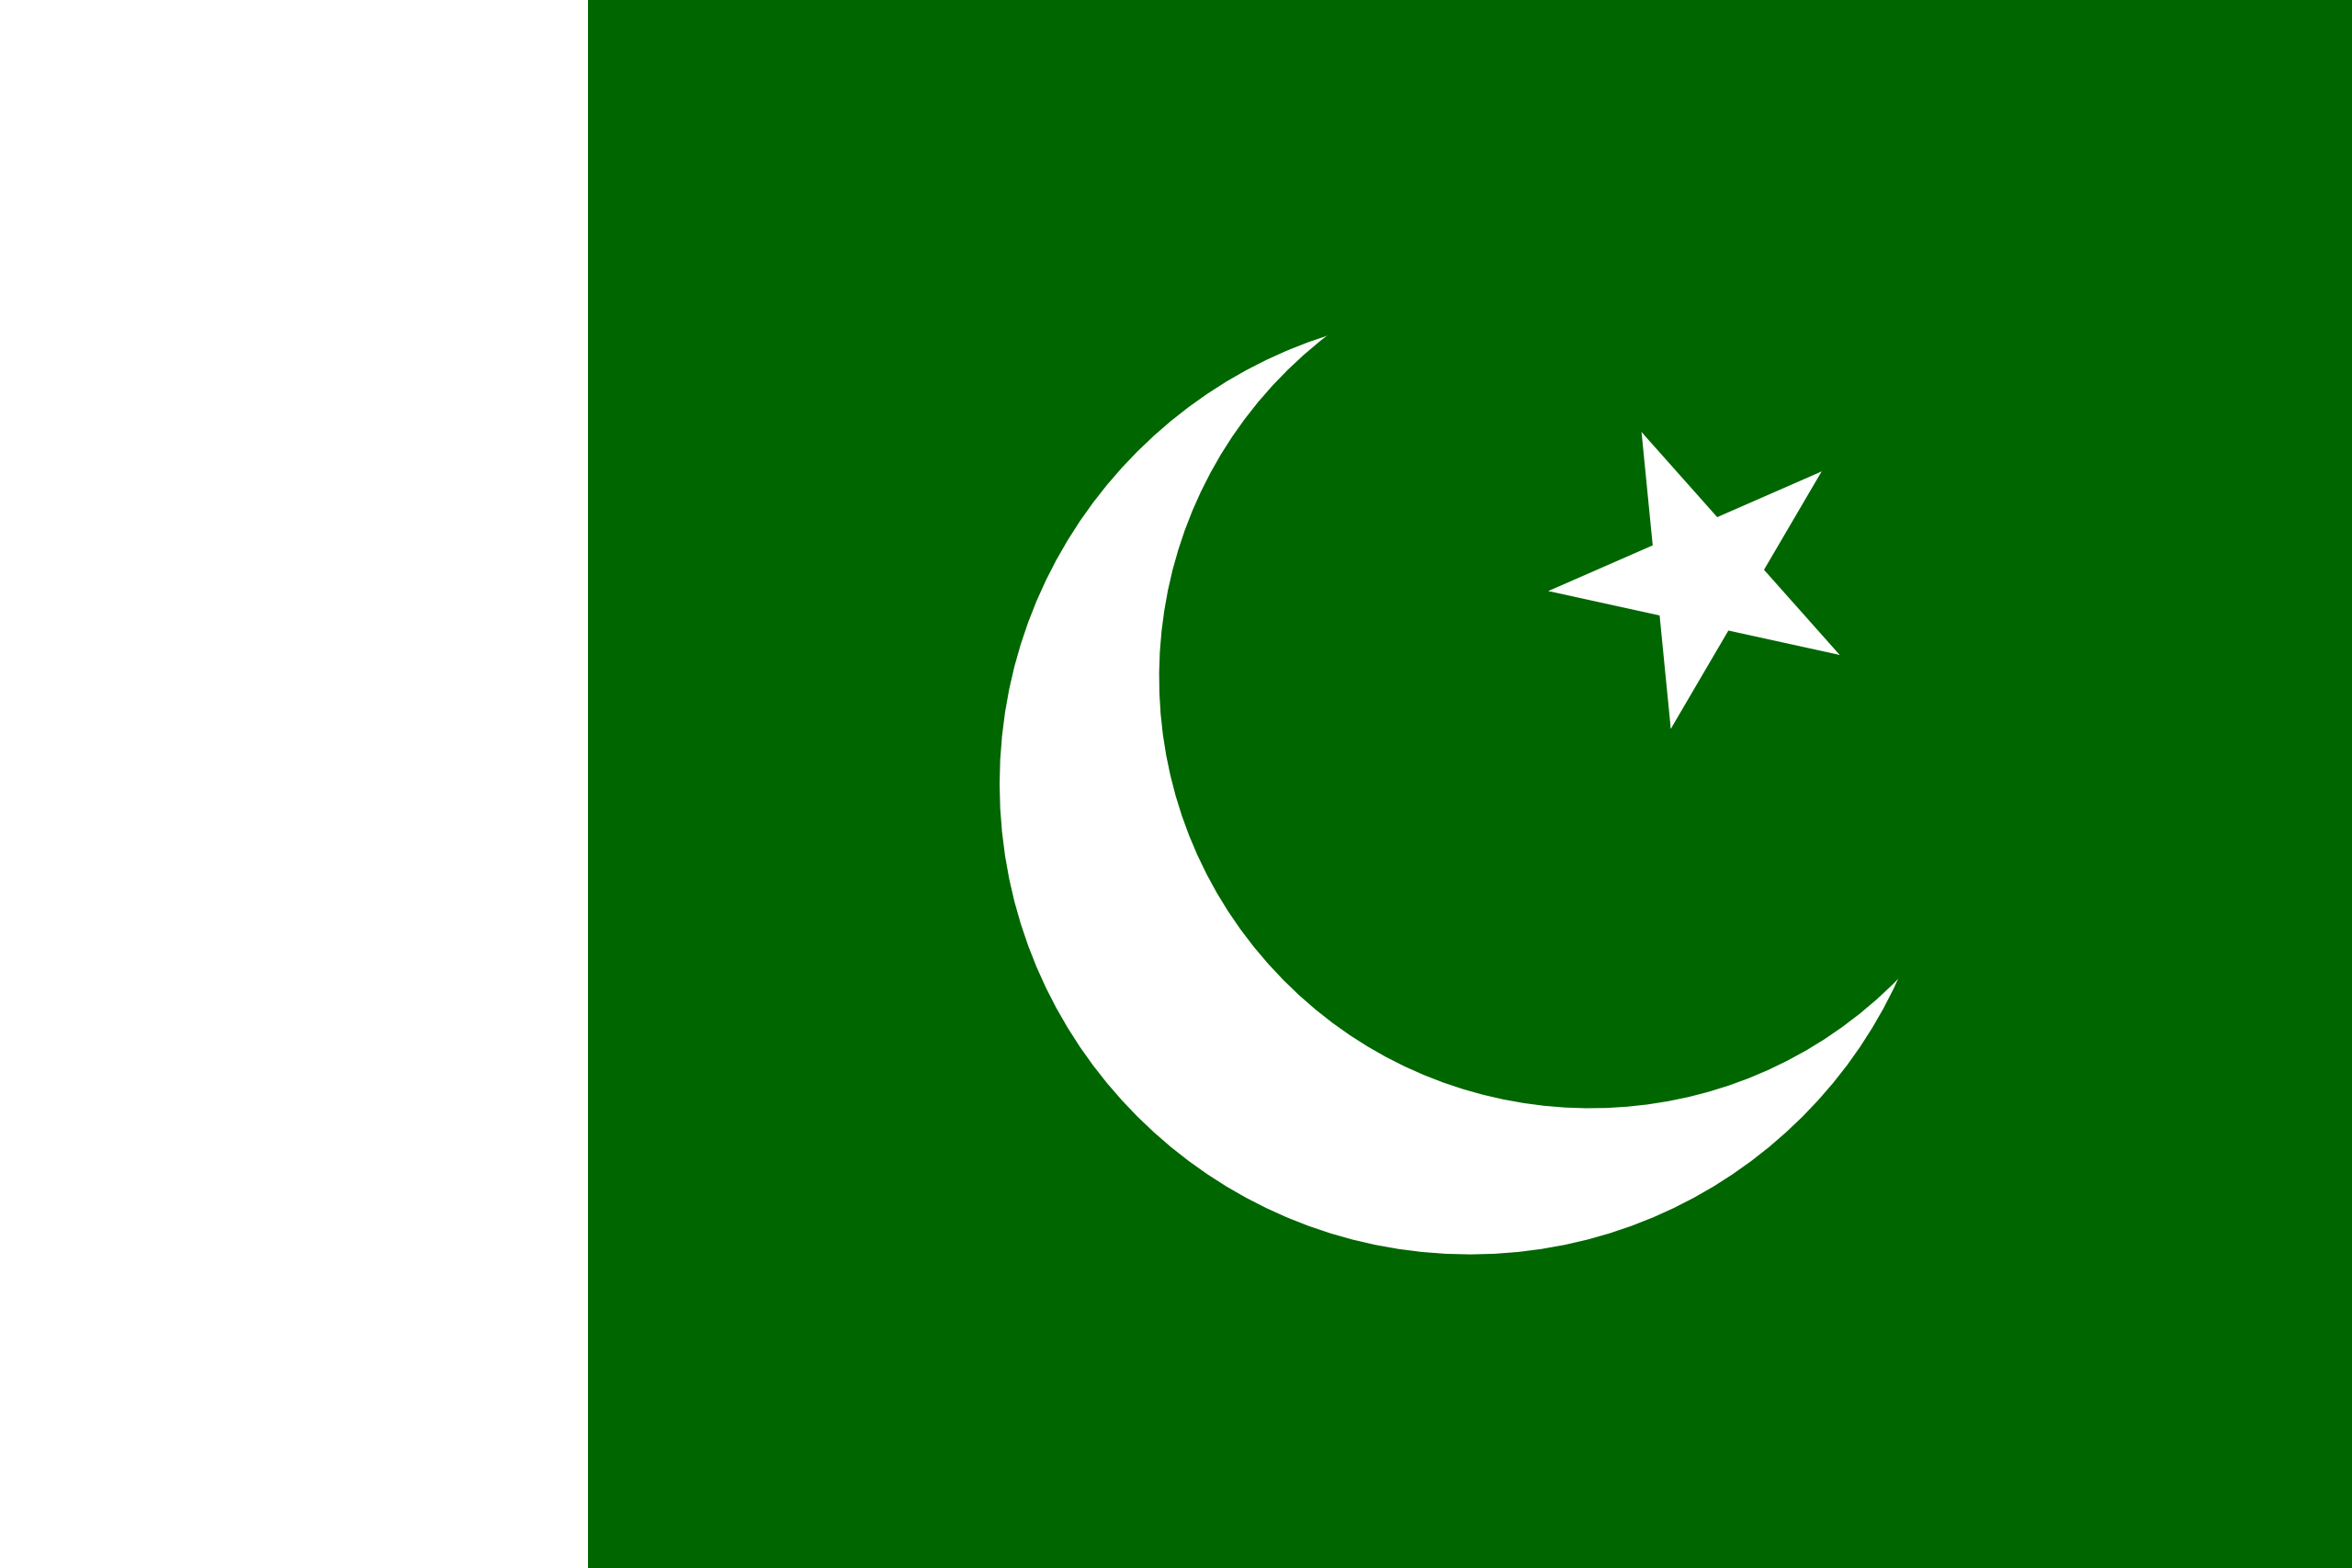 pakistán, paese, emblema, logo, simbolo - Sfondi HD - Professor-falken.com